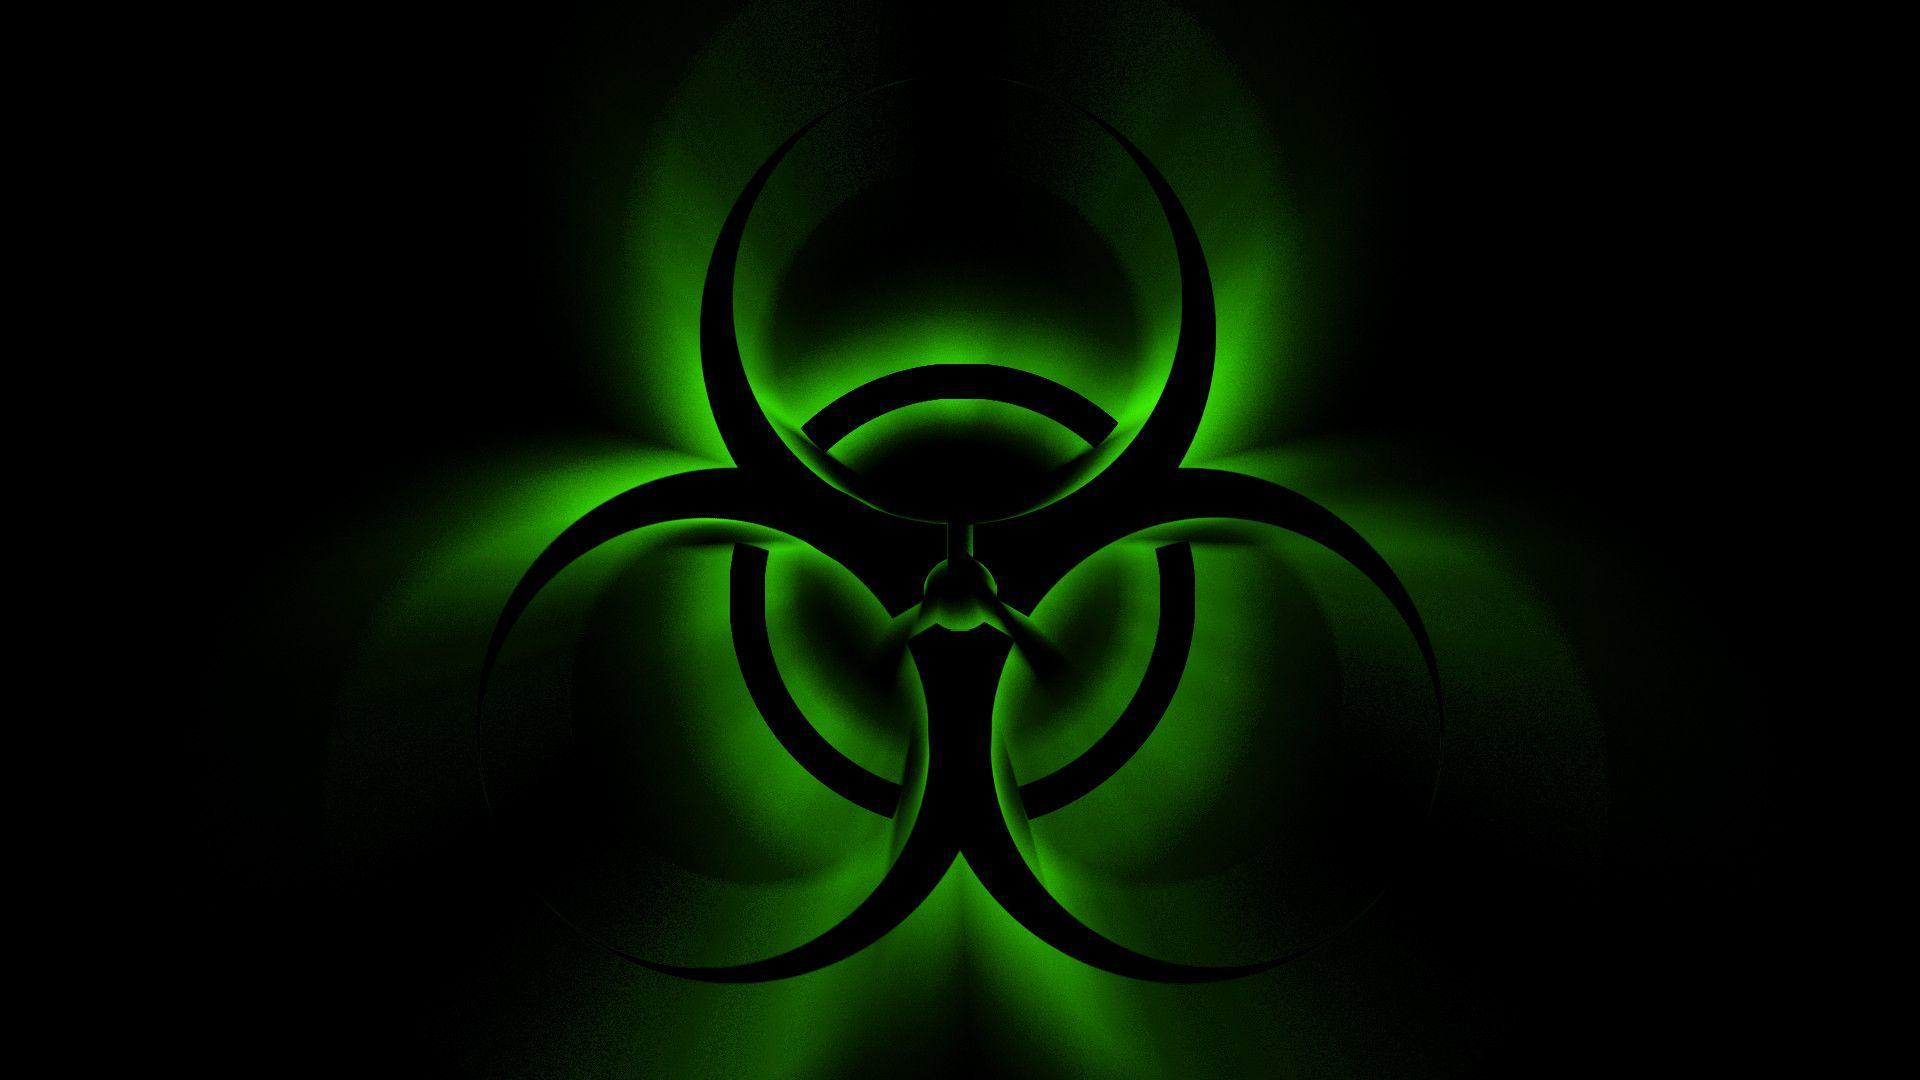 wallpaper.wiki-biohazard-symbol-wallpaper-full-hd-pic-wpb0014946